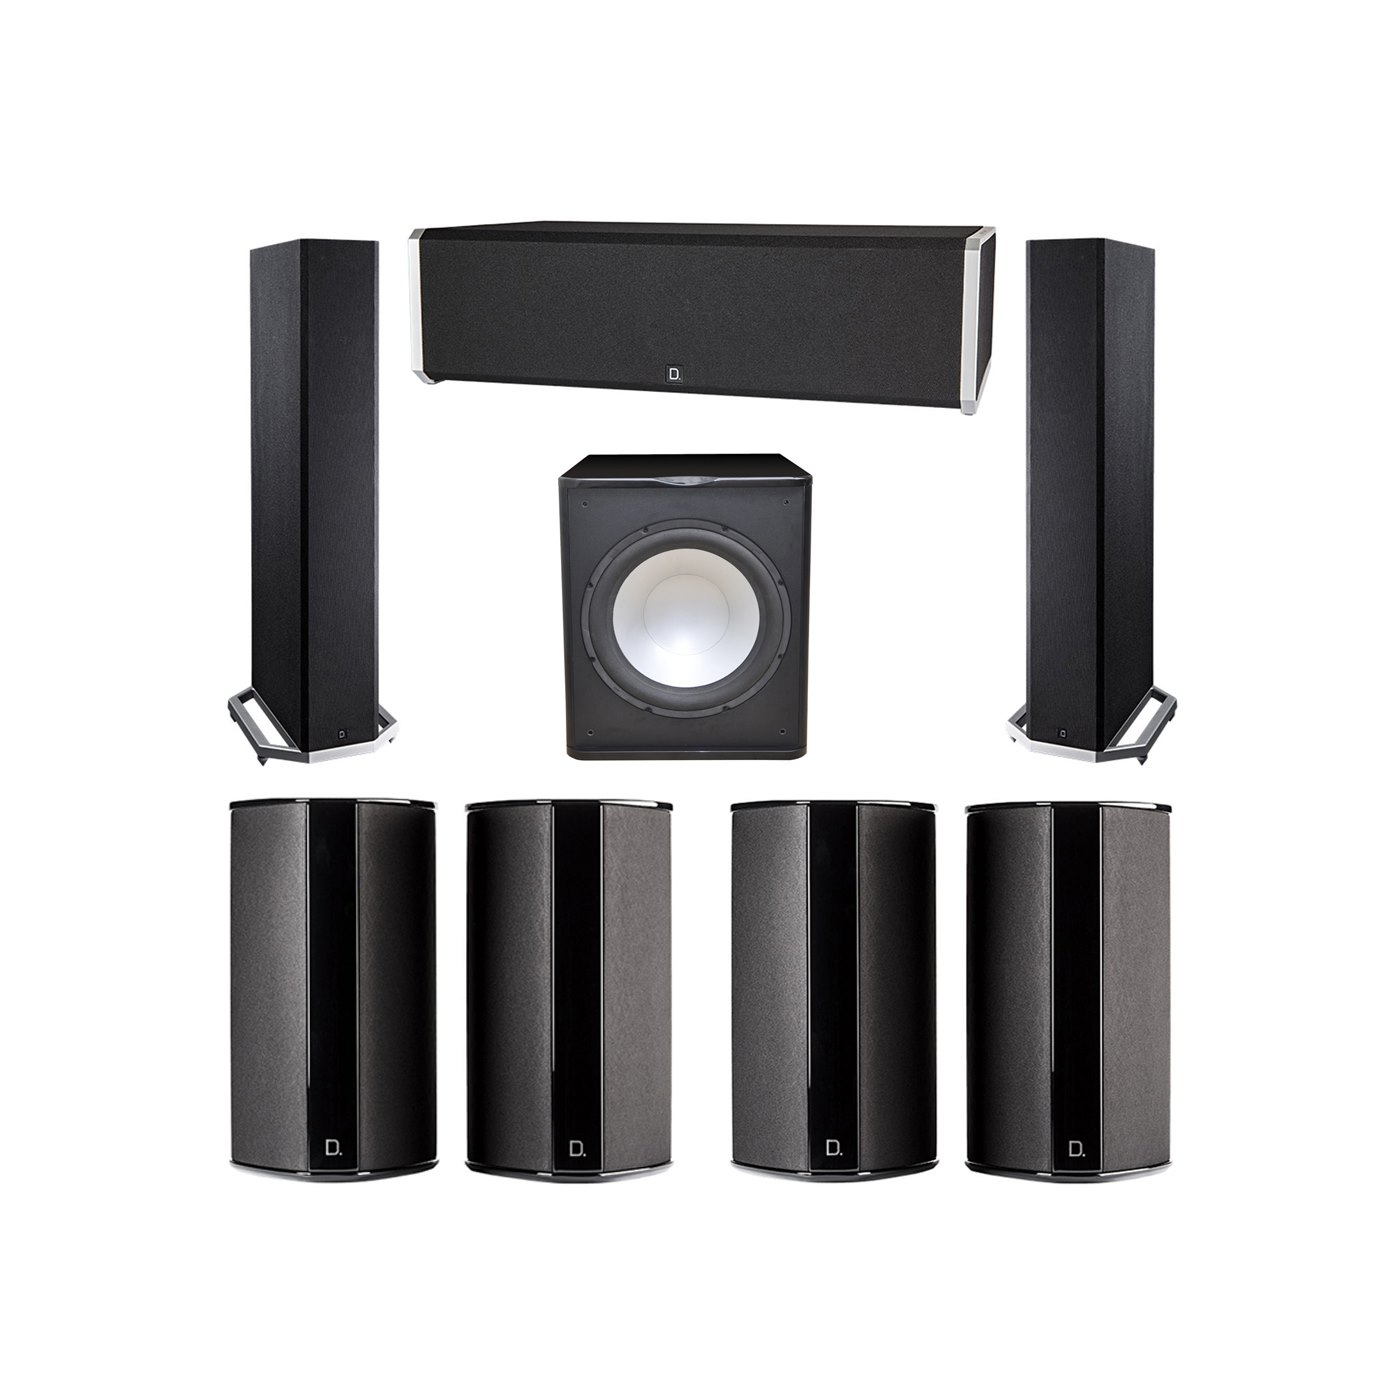 Definitive Technology 7.1 System with 2 BP9020 Tower Speakers, 1 CS9040 Center Channel Speaker, 4 SR9080 Surround Speaker, 1 Premier Acoustic PA-150 Subwoofer